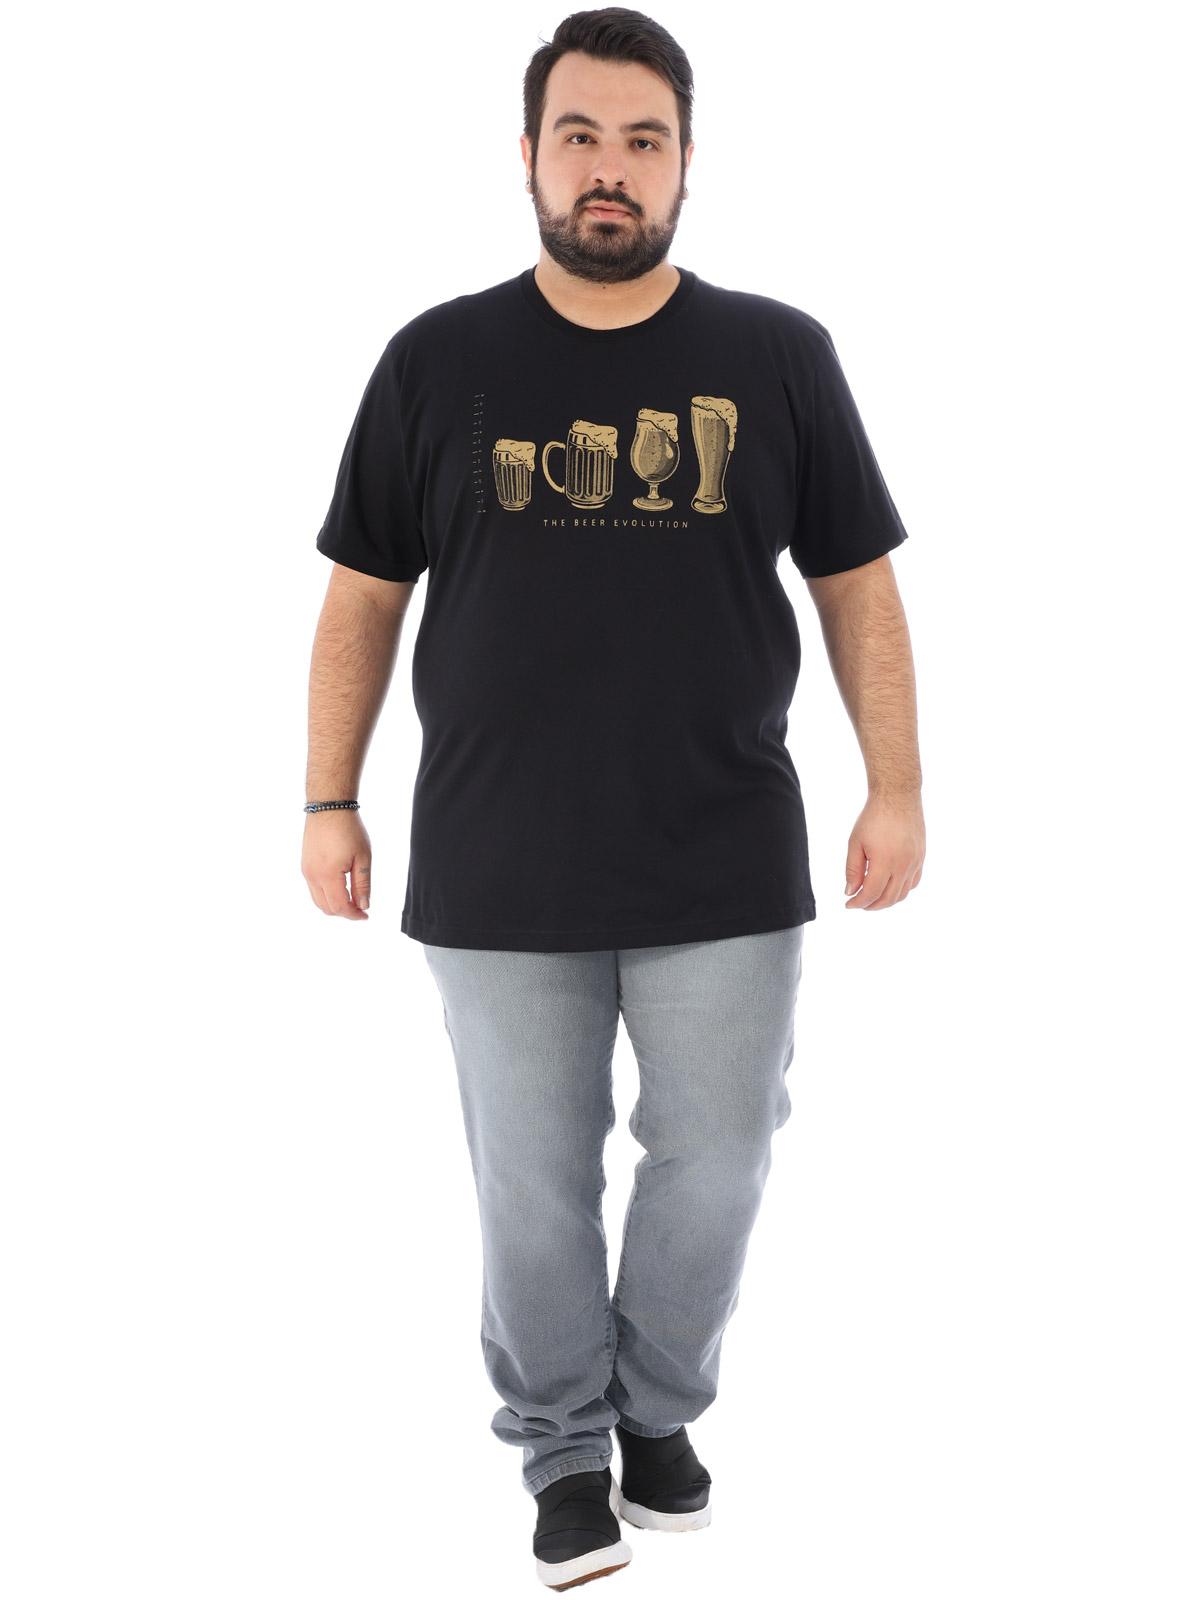 Camiseta Plus Size Masculina Estampada Bear Anistia Preta